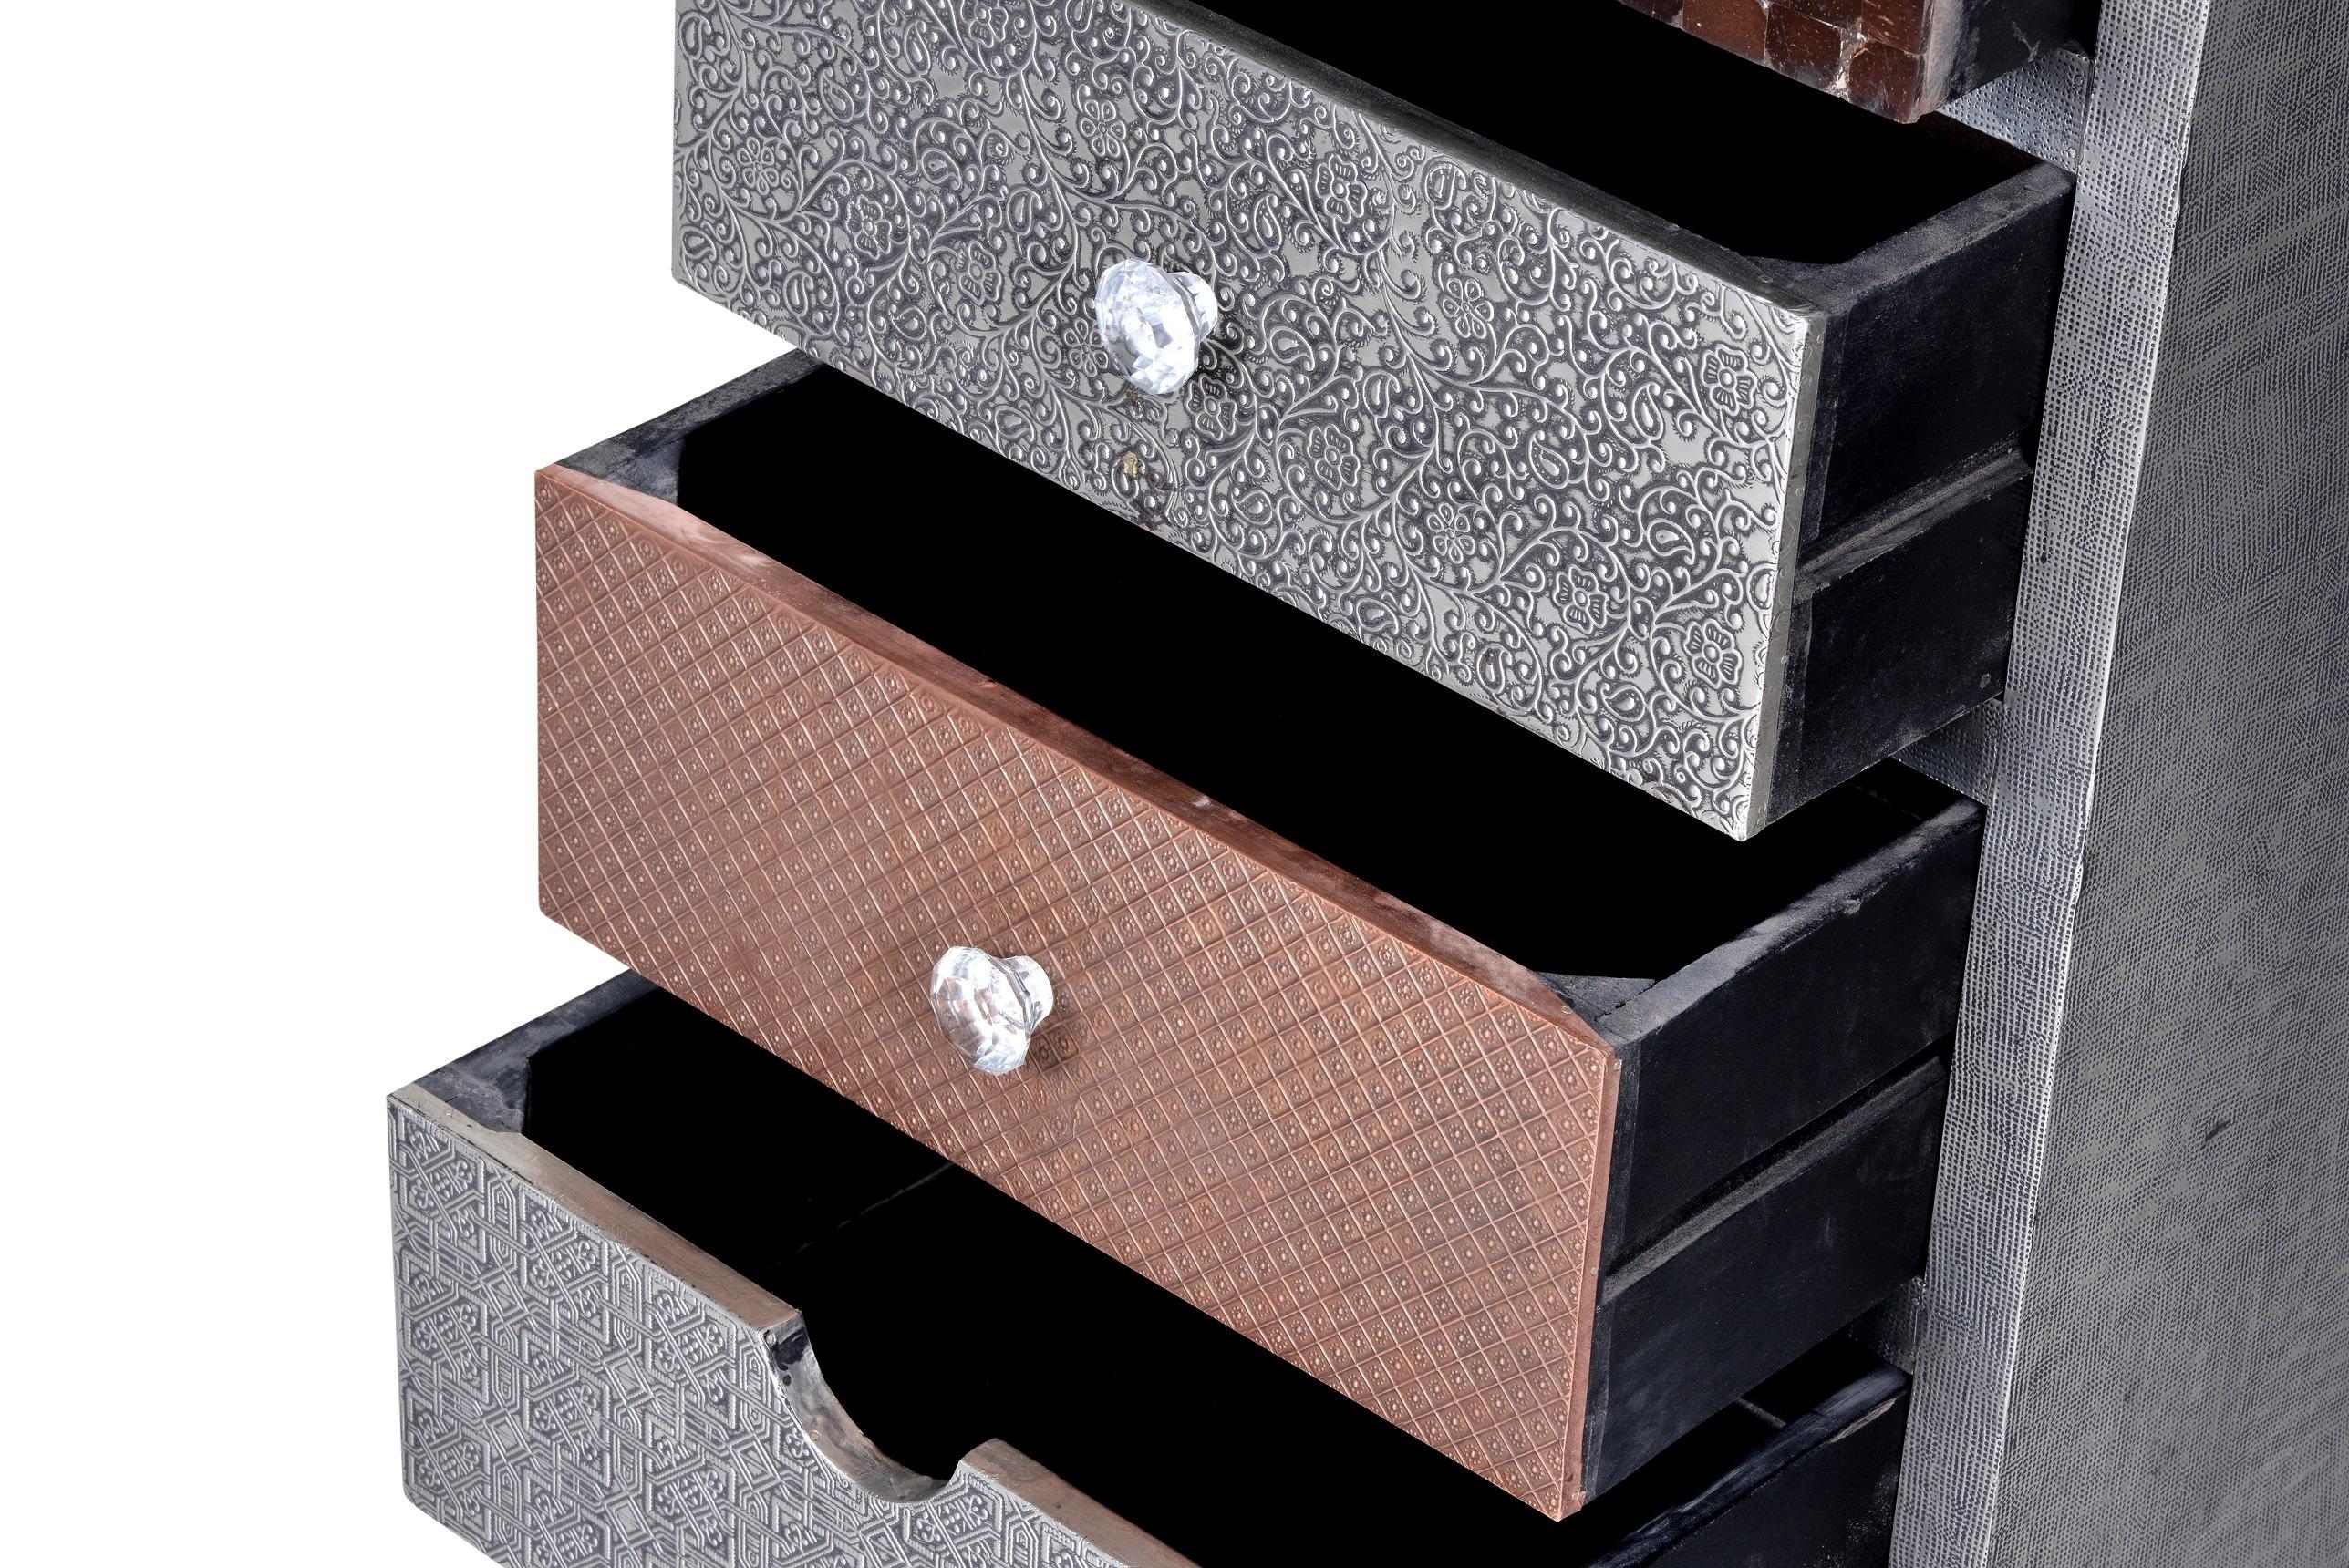 Kommode Metall Meton mit vielen Dekormaterialien